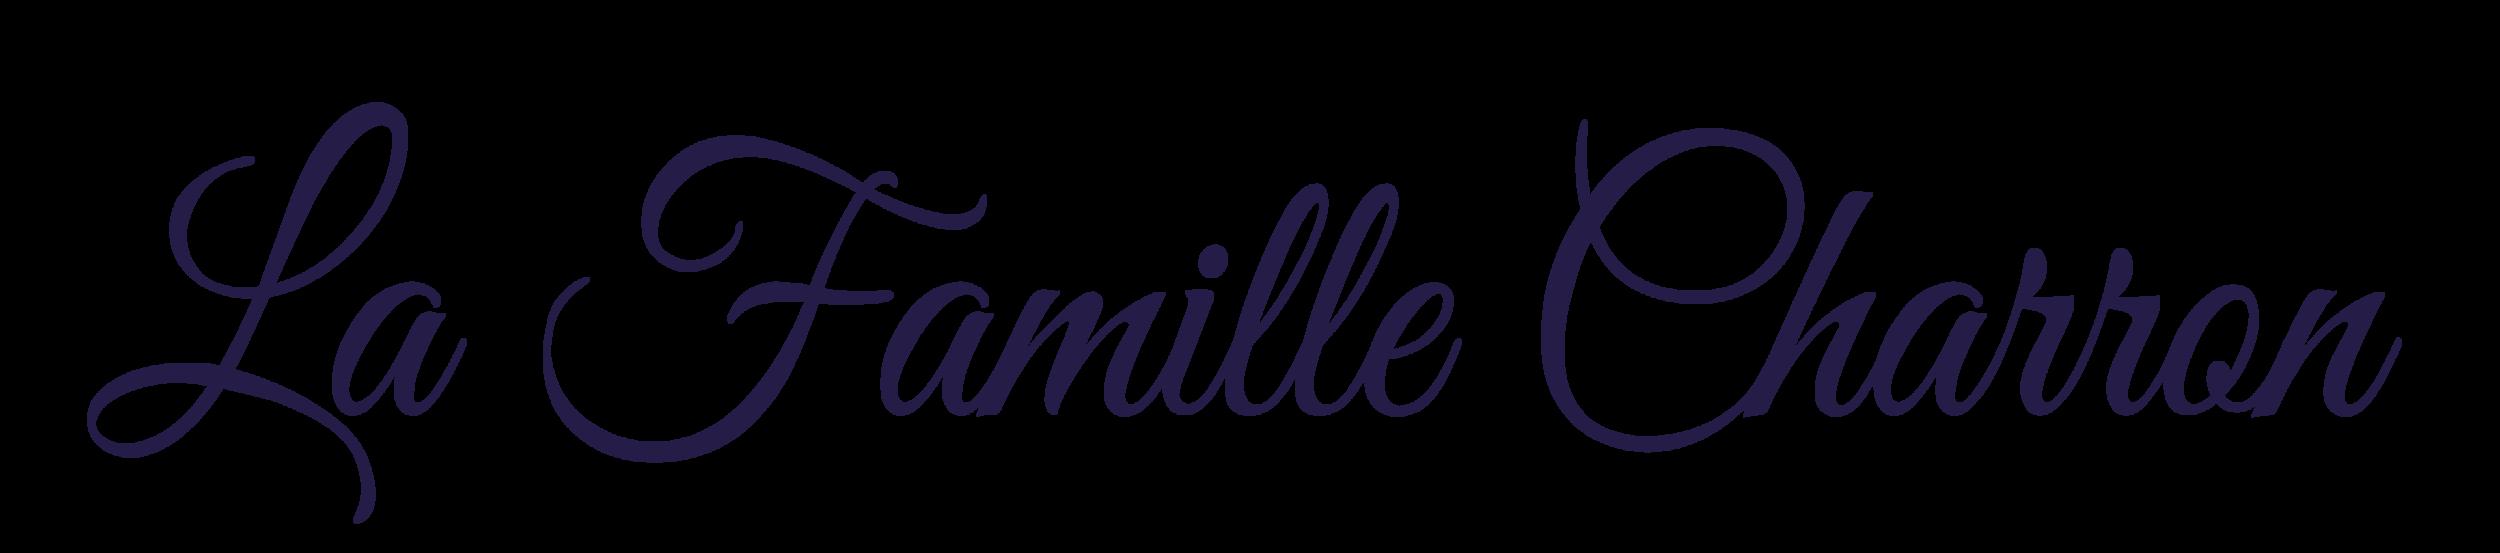 FamilleCharron_Logo.png